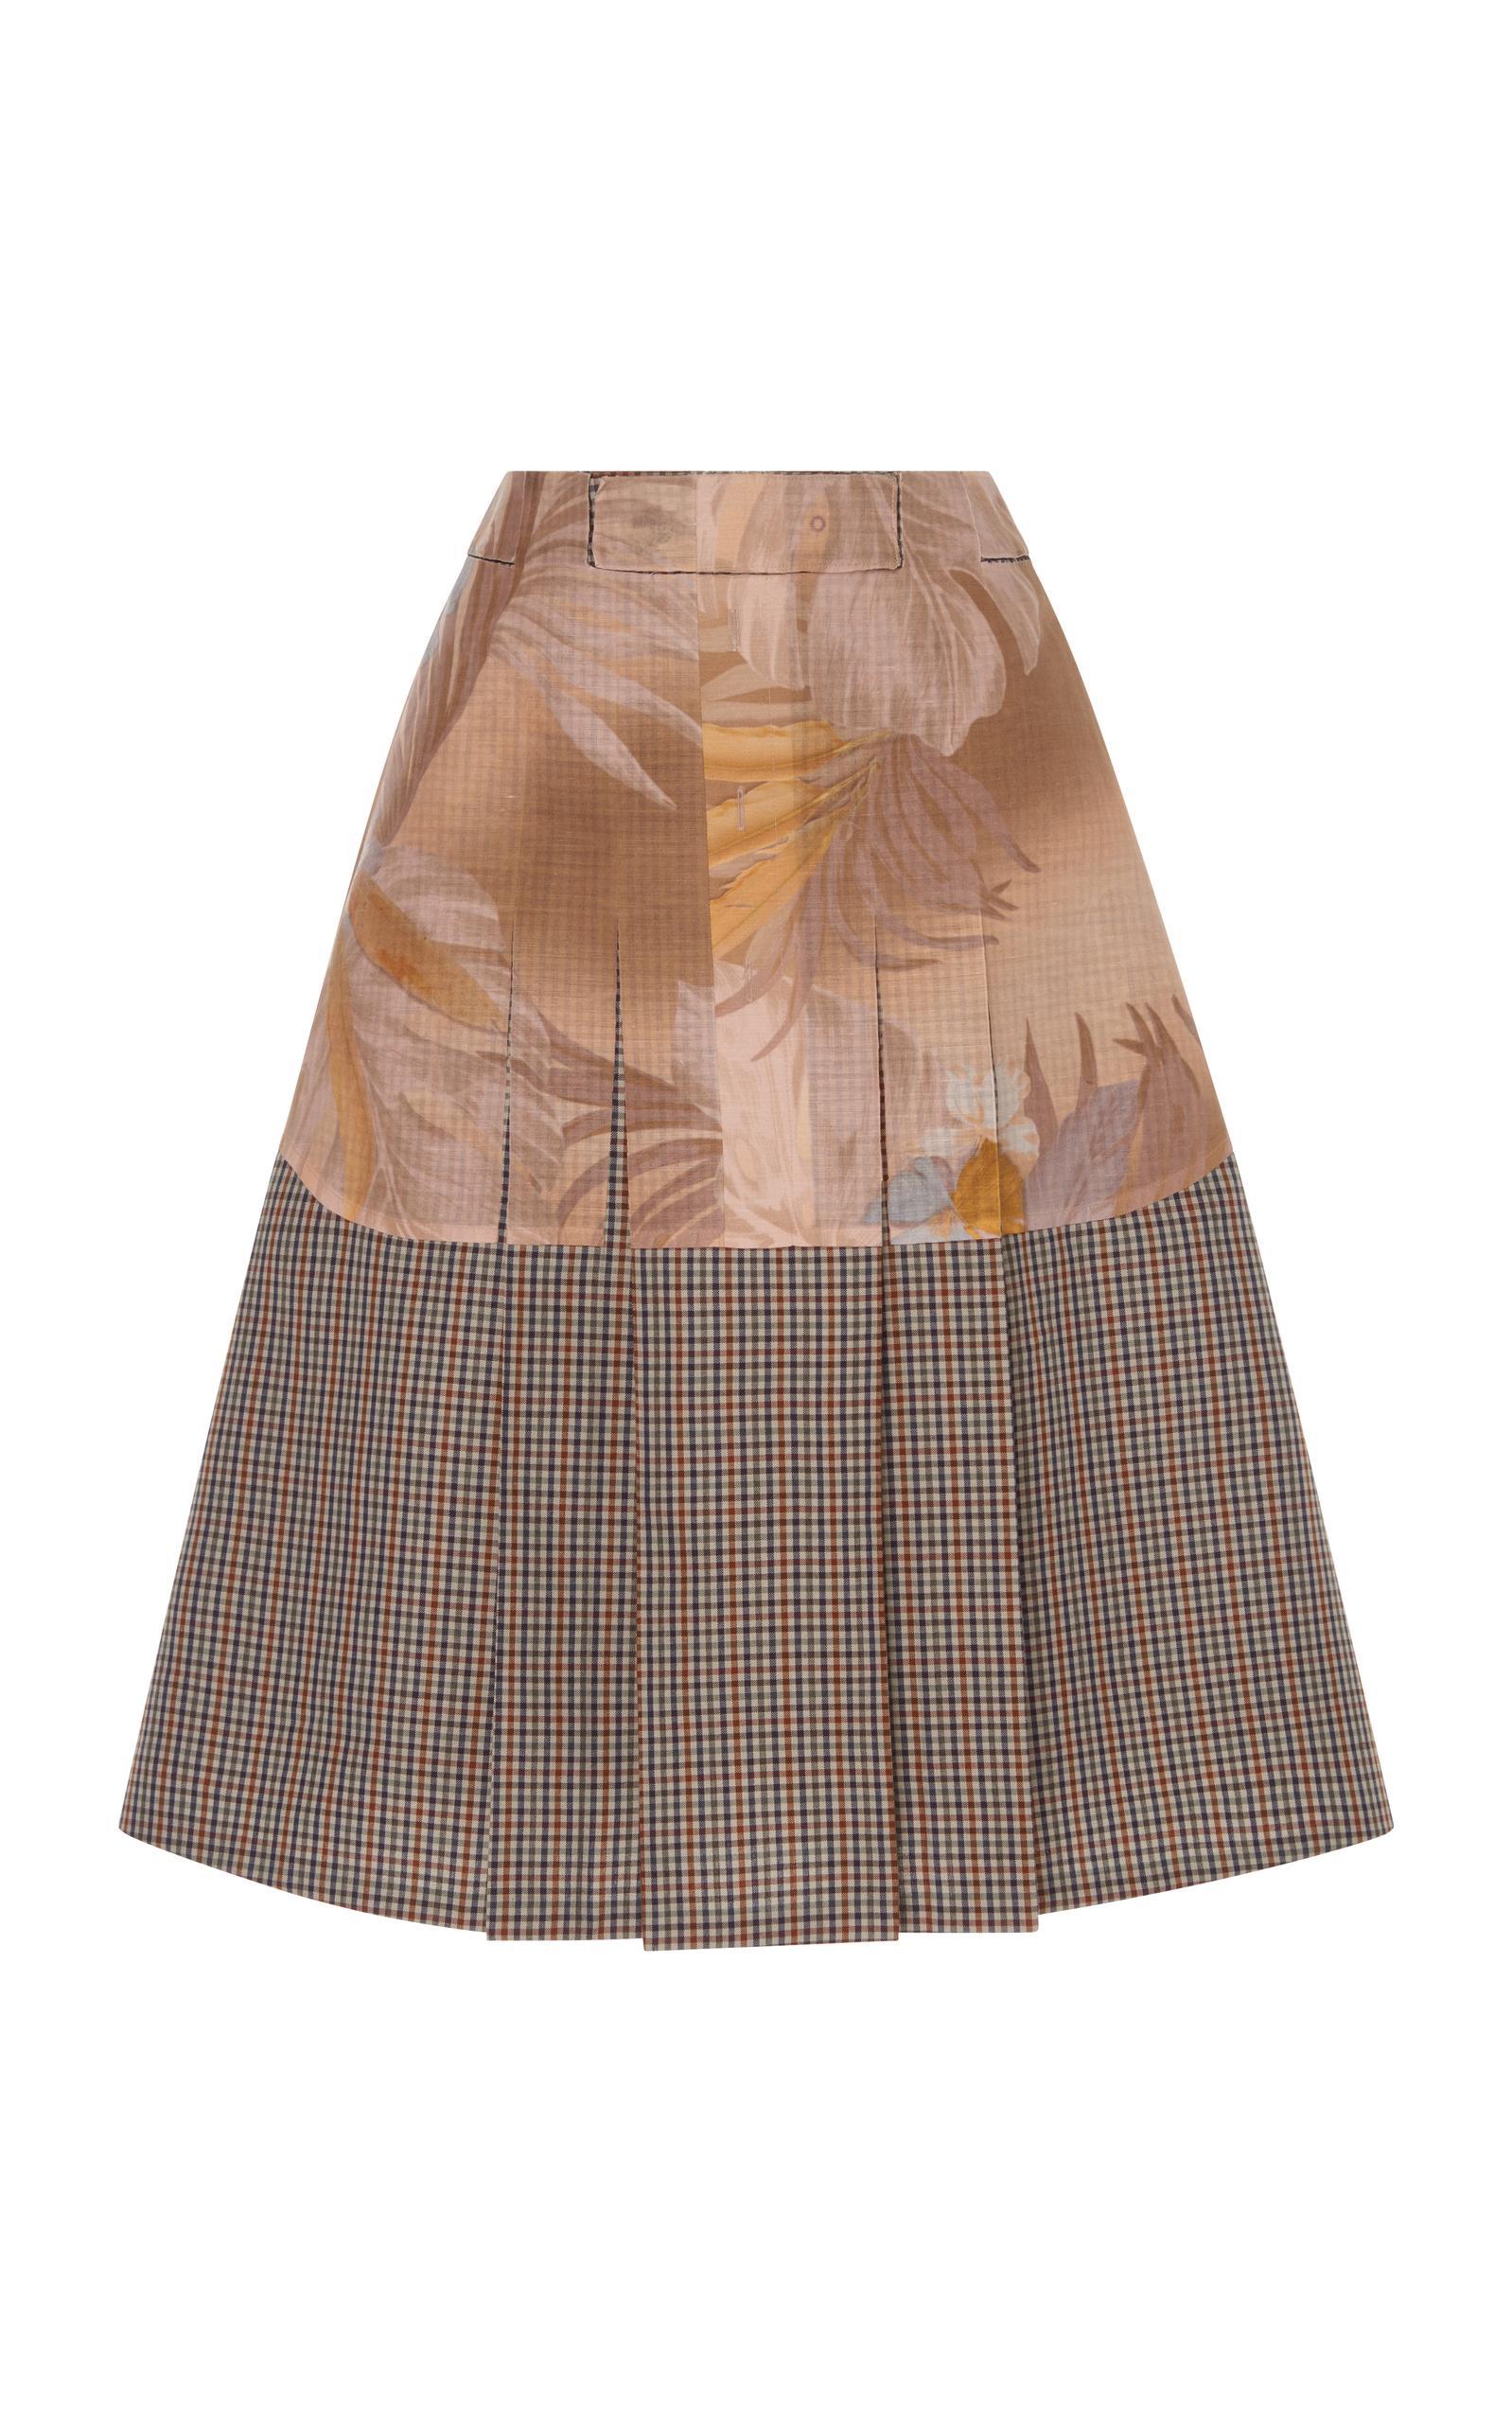 Maison Margiela Tropical Microcheck Print Skirt In Multi